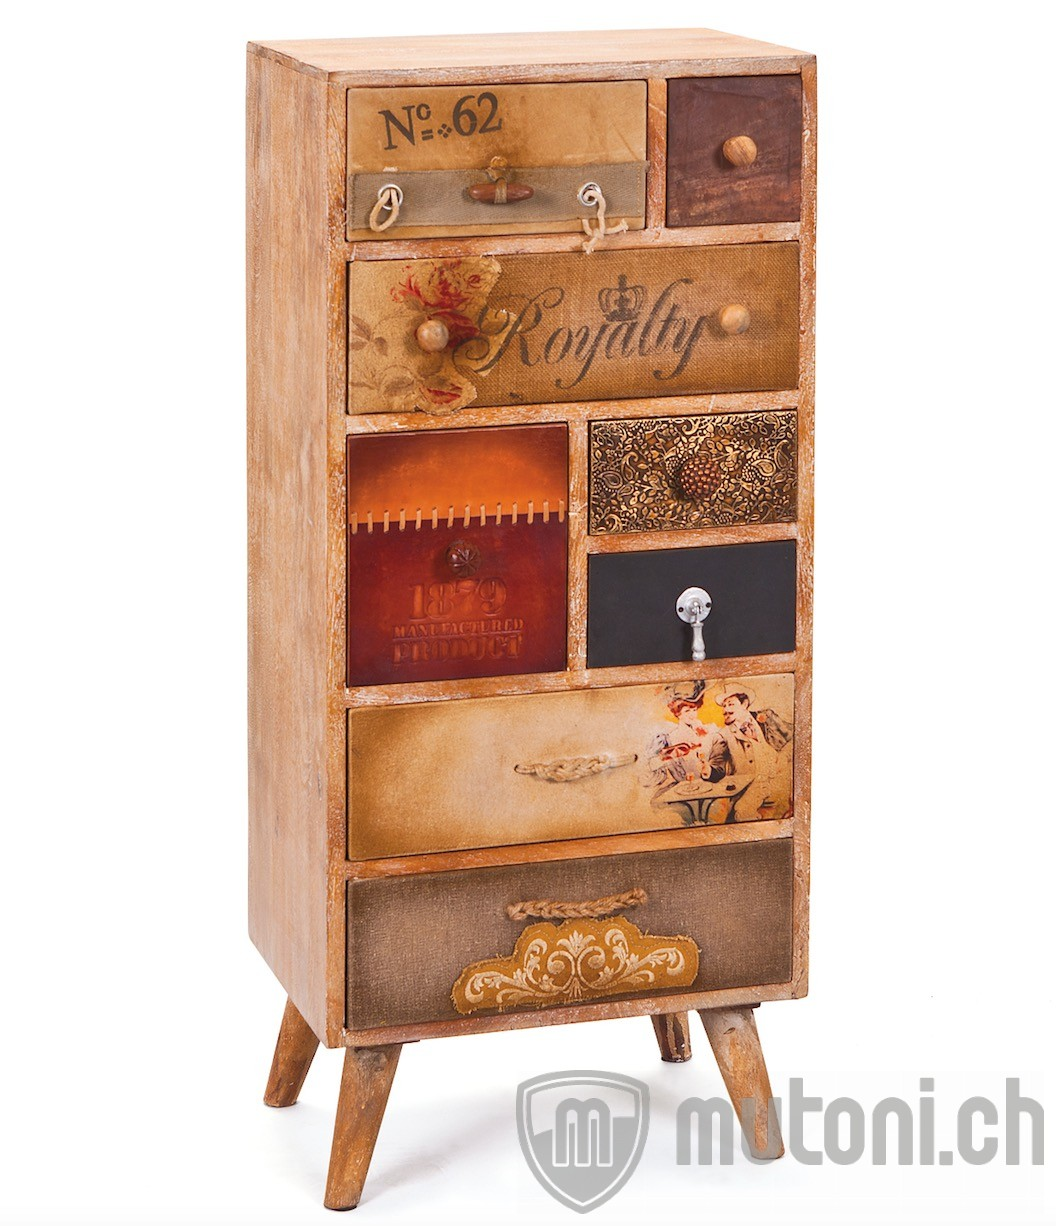 hochkommode old vintage 45x102 mutoni vintage mutoni m bel. Black Bedroom Furniture Sets. Home Design Ideas